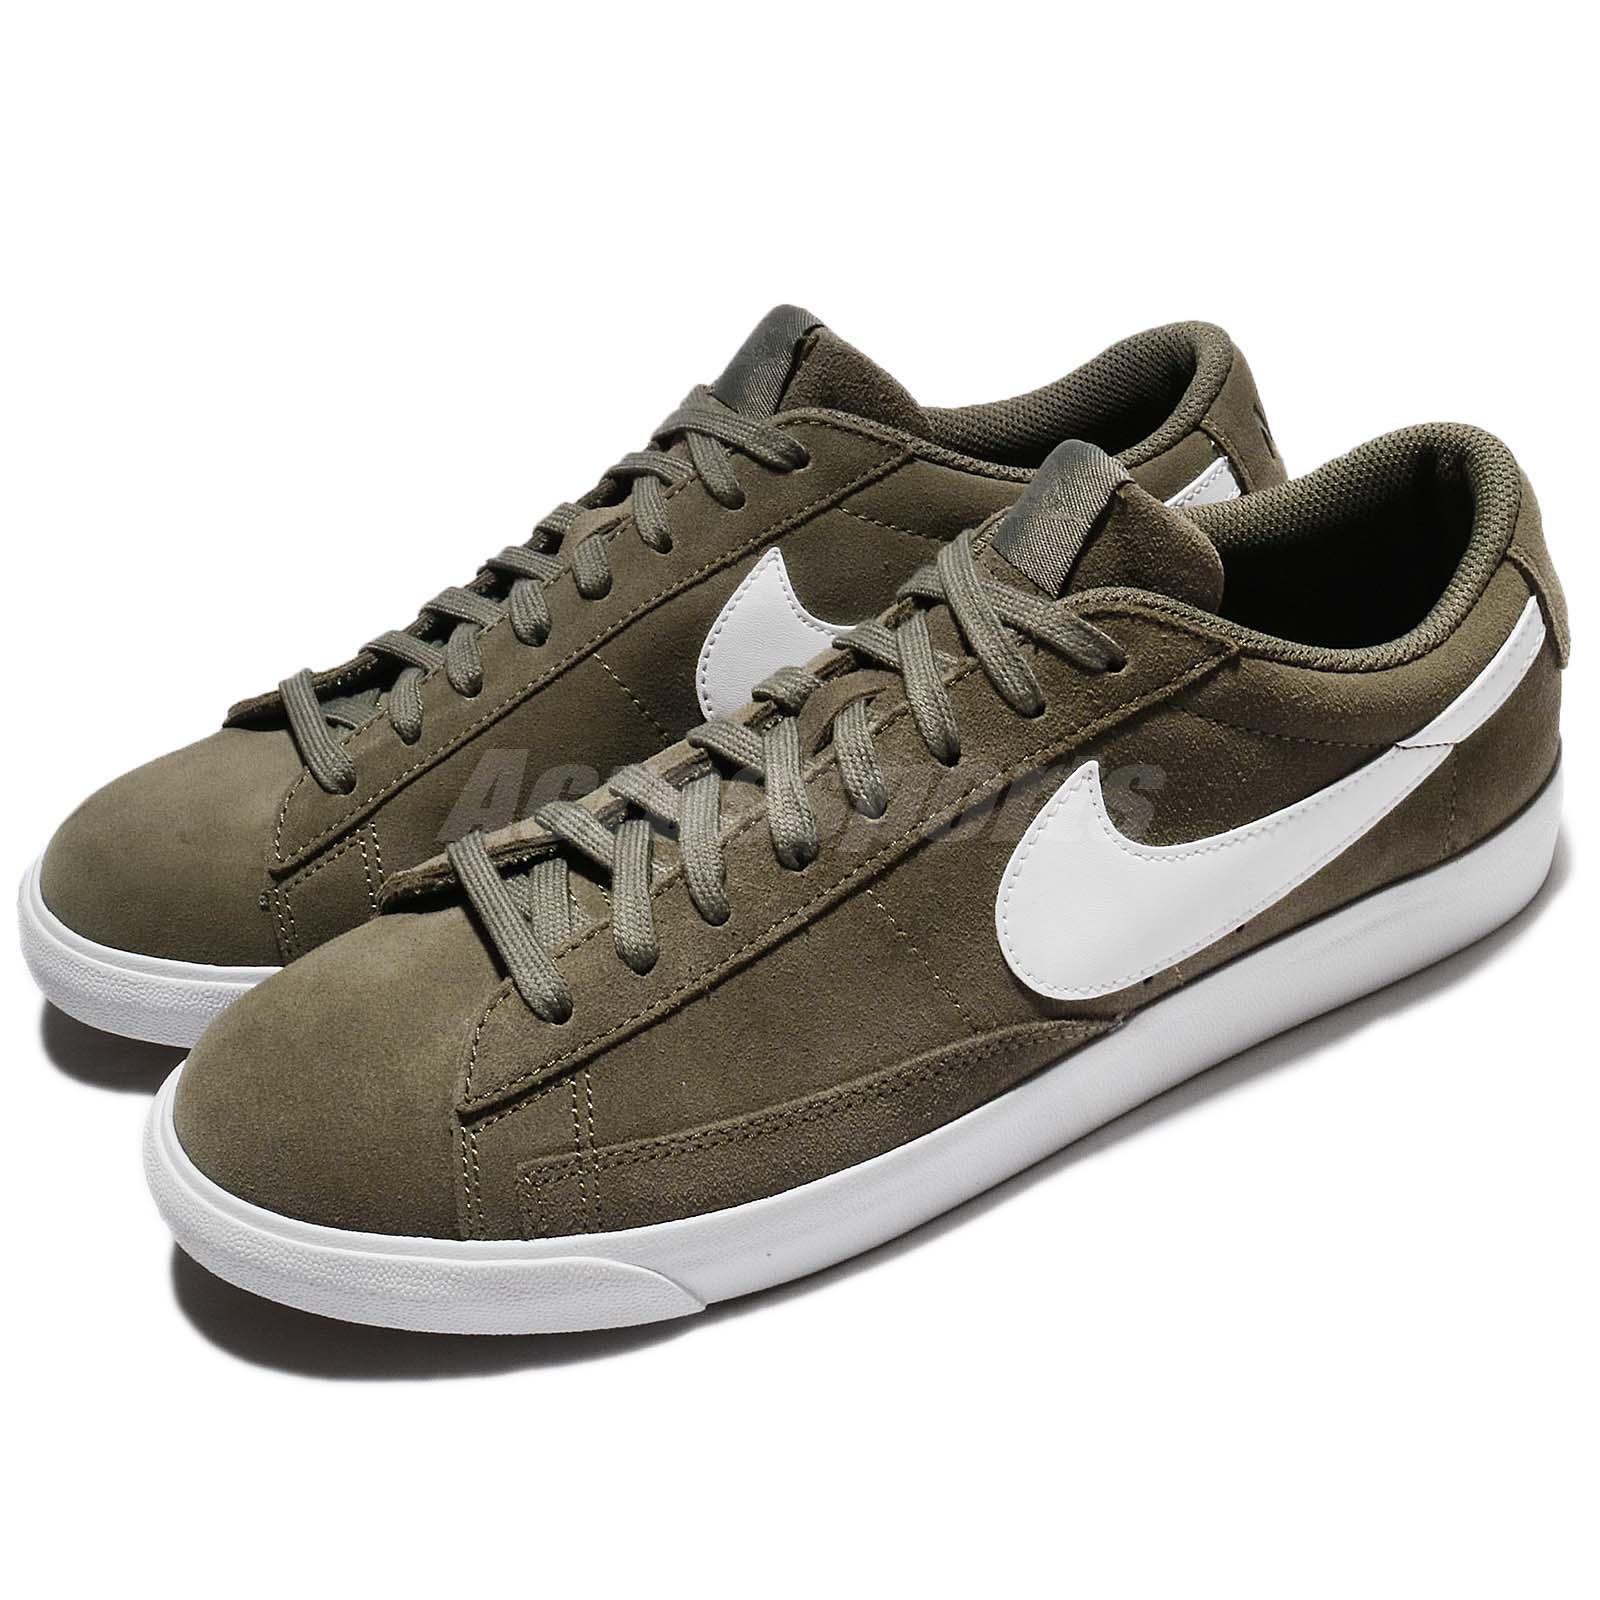 nike mens classic schuhen schuhe sneakers casual - blazer mit schuhen classic ab 1. 3a0099